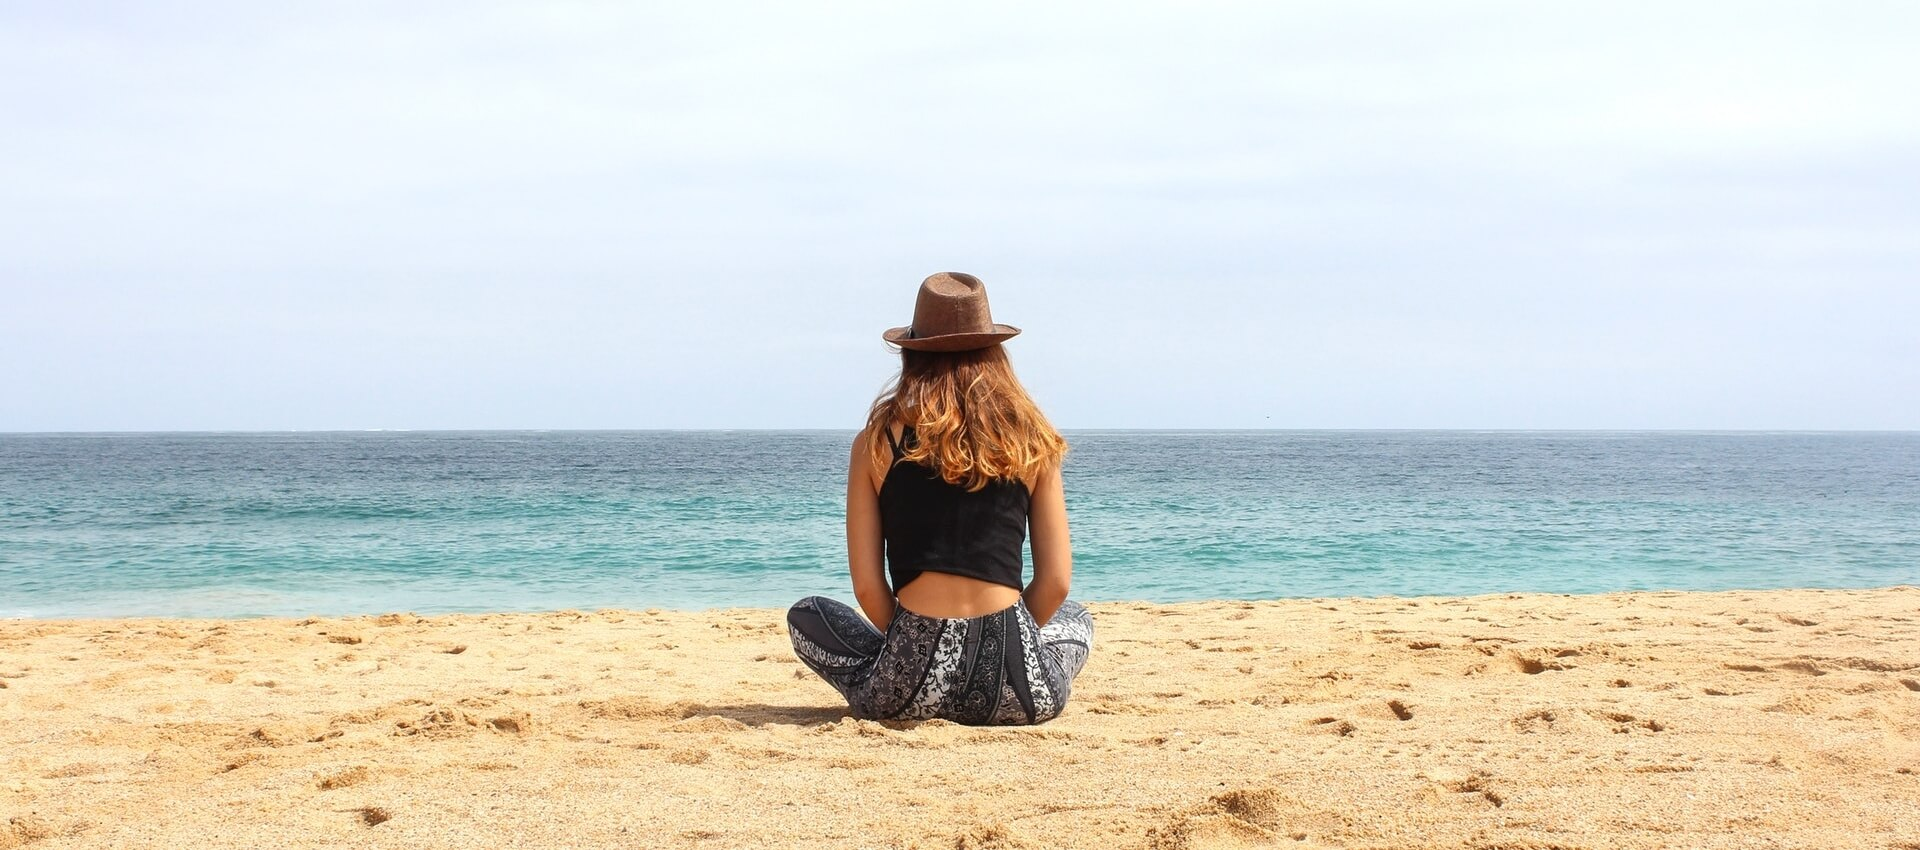 Reisebüro Urlaubsgefühl